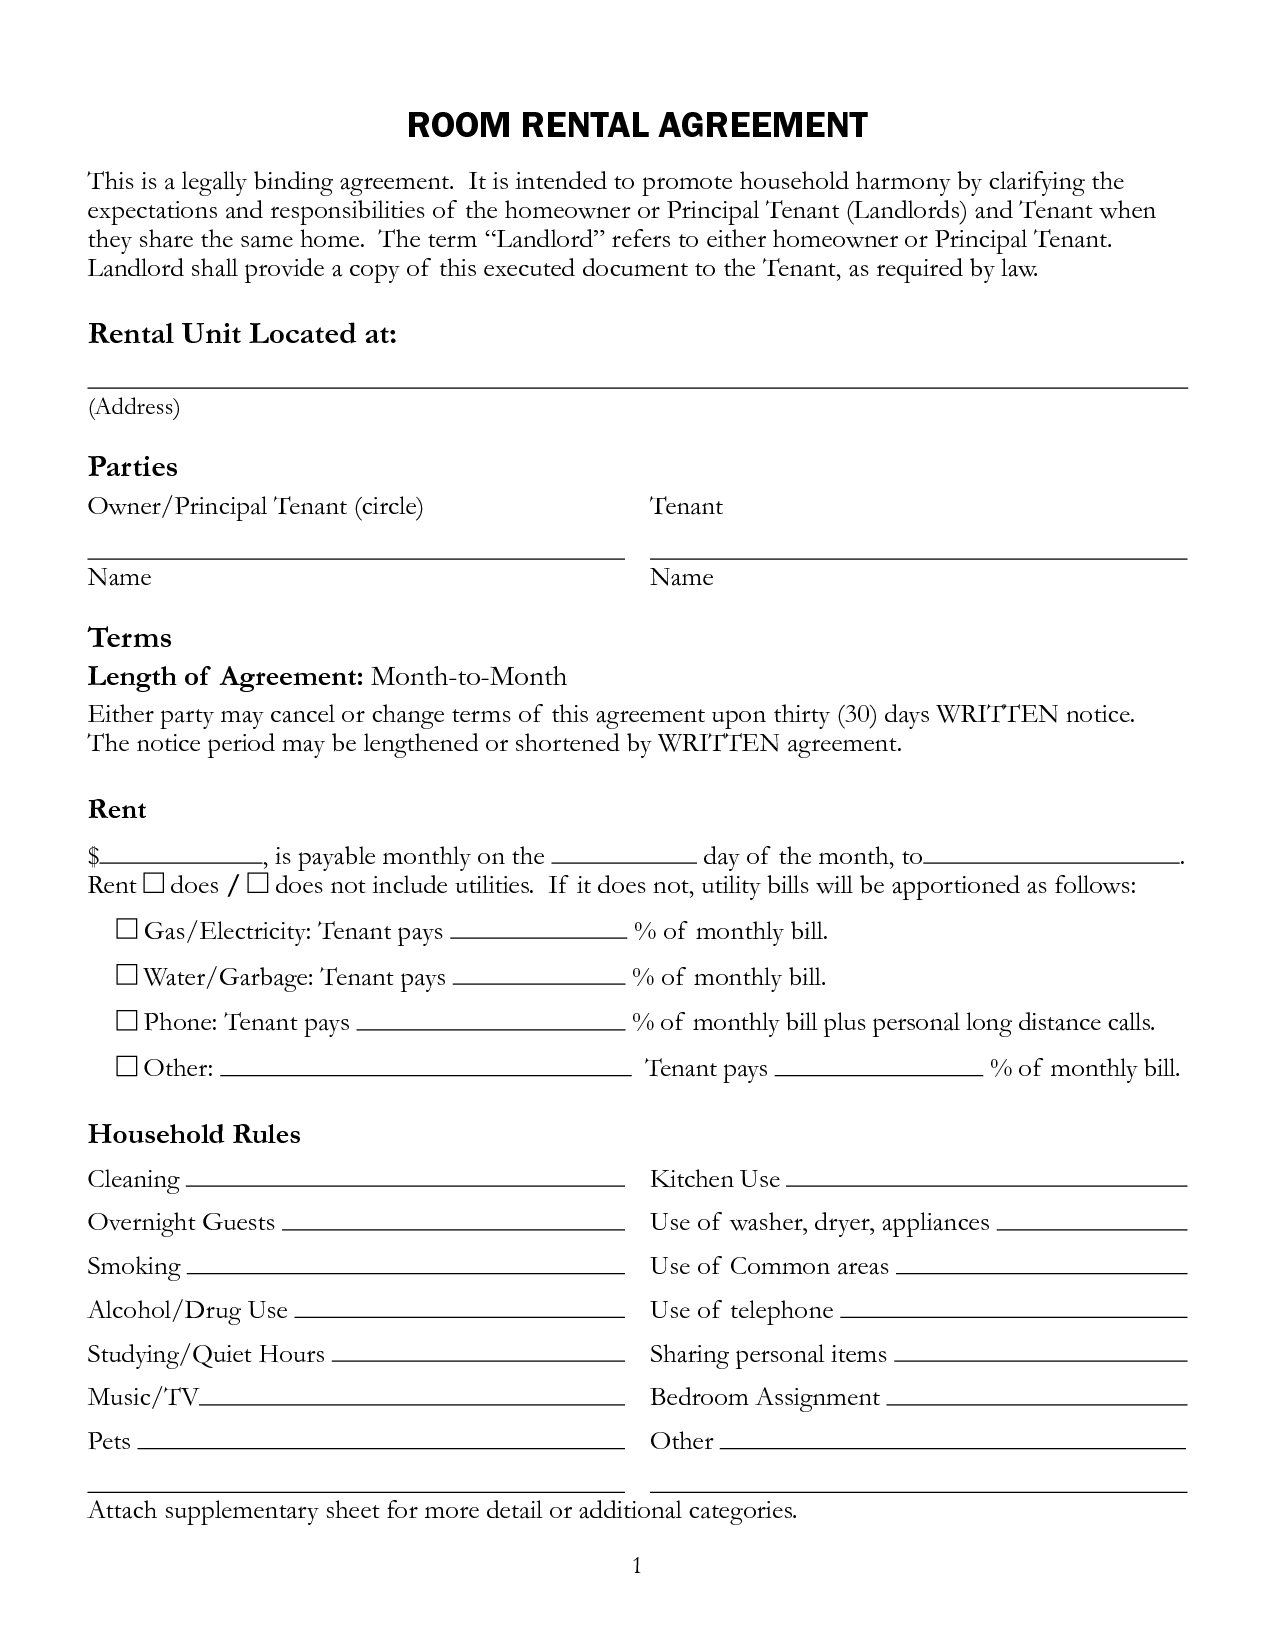 Free Printable Rental Lease Agreement Form Template | Bagnas - Free Printable Rental Lease Agreement